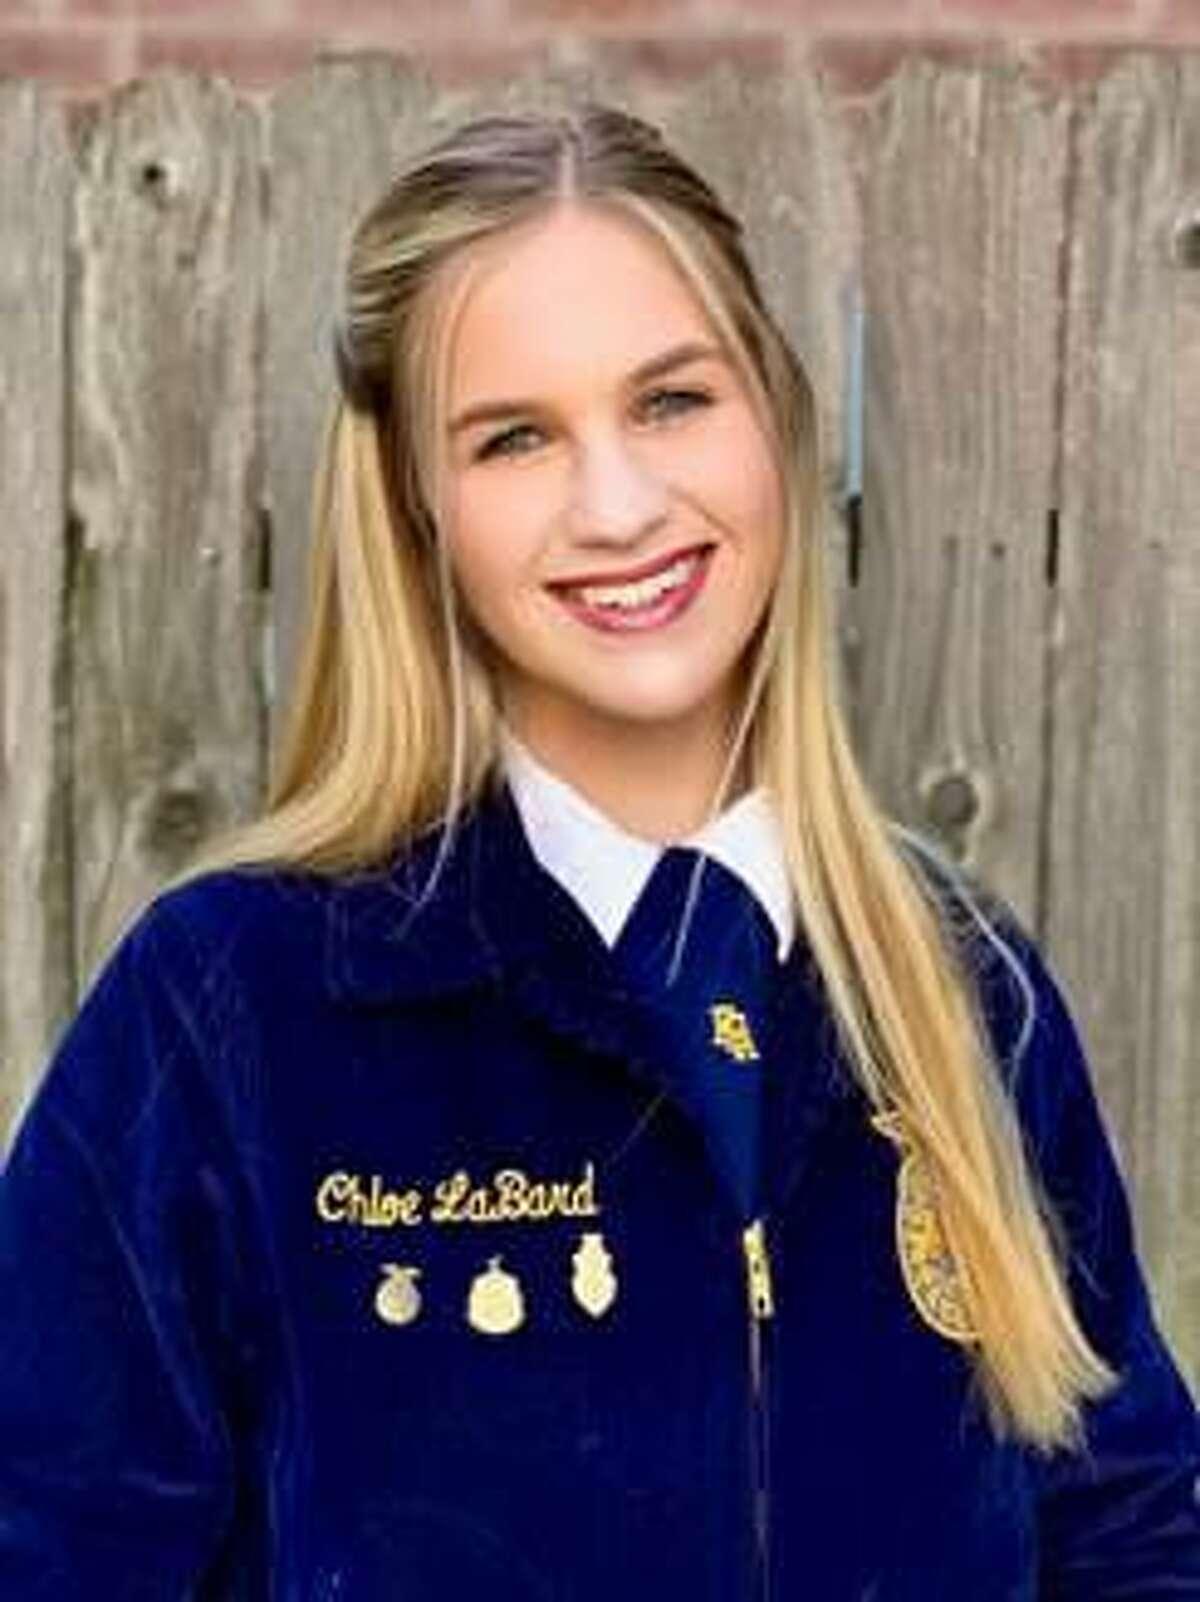 Taylor High School's Chloe LaBard recently earned a $20,000 scholarship from the Texas FFA Association.